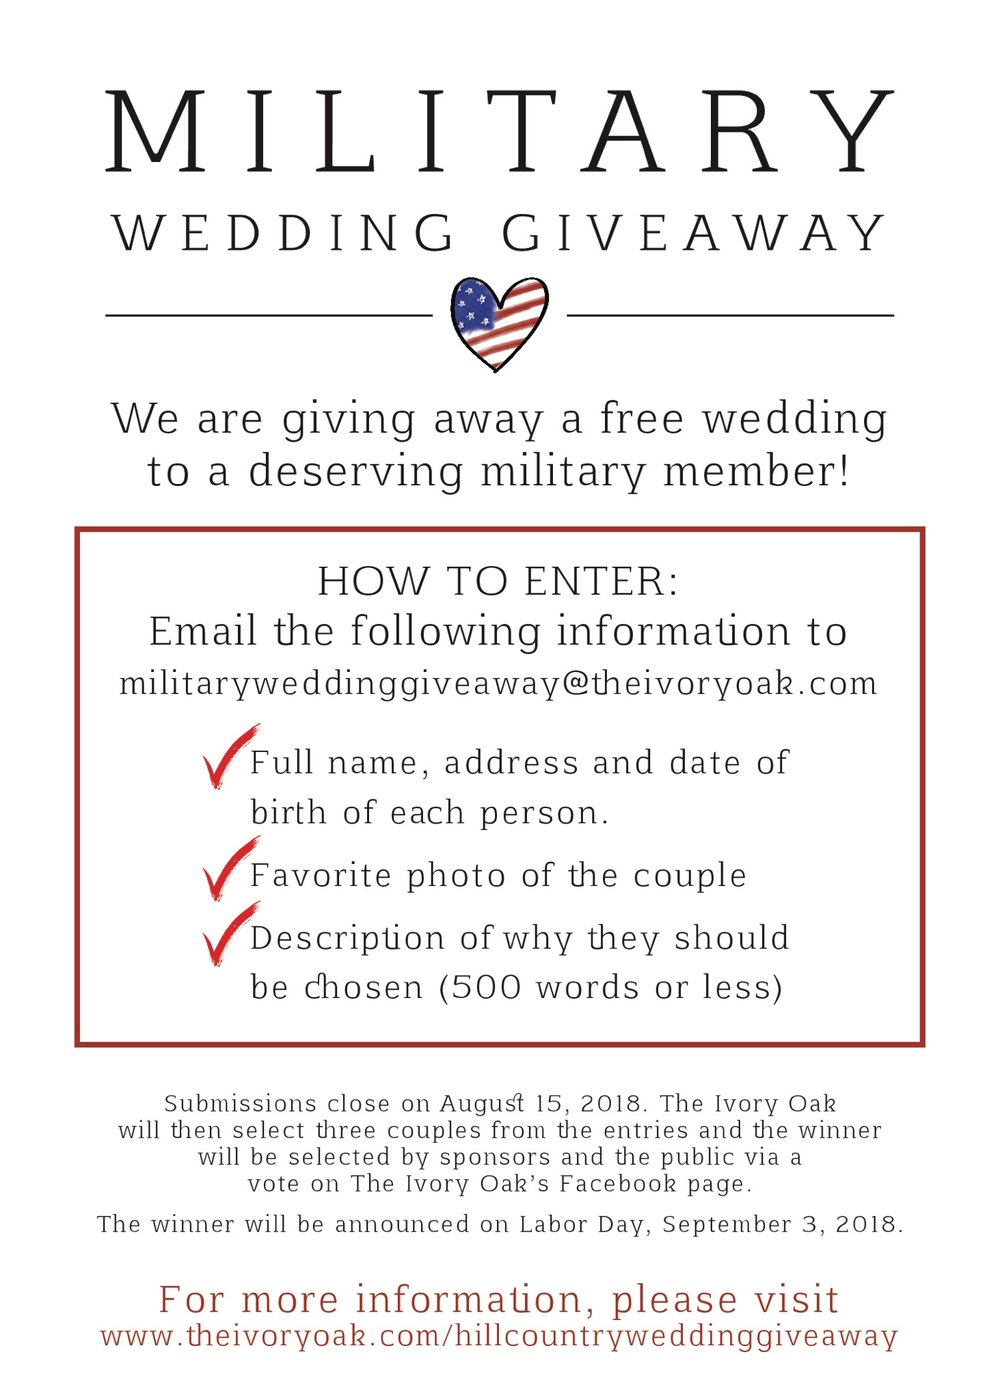 The Ivory Oak - Military Wedding Giveaway Flyer.jpeg